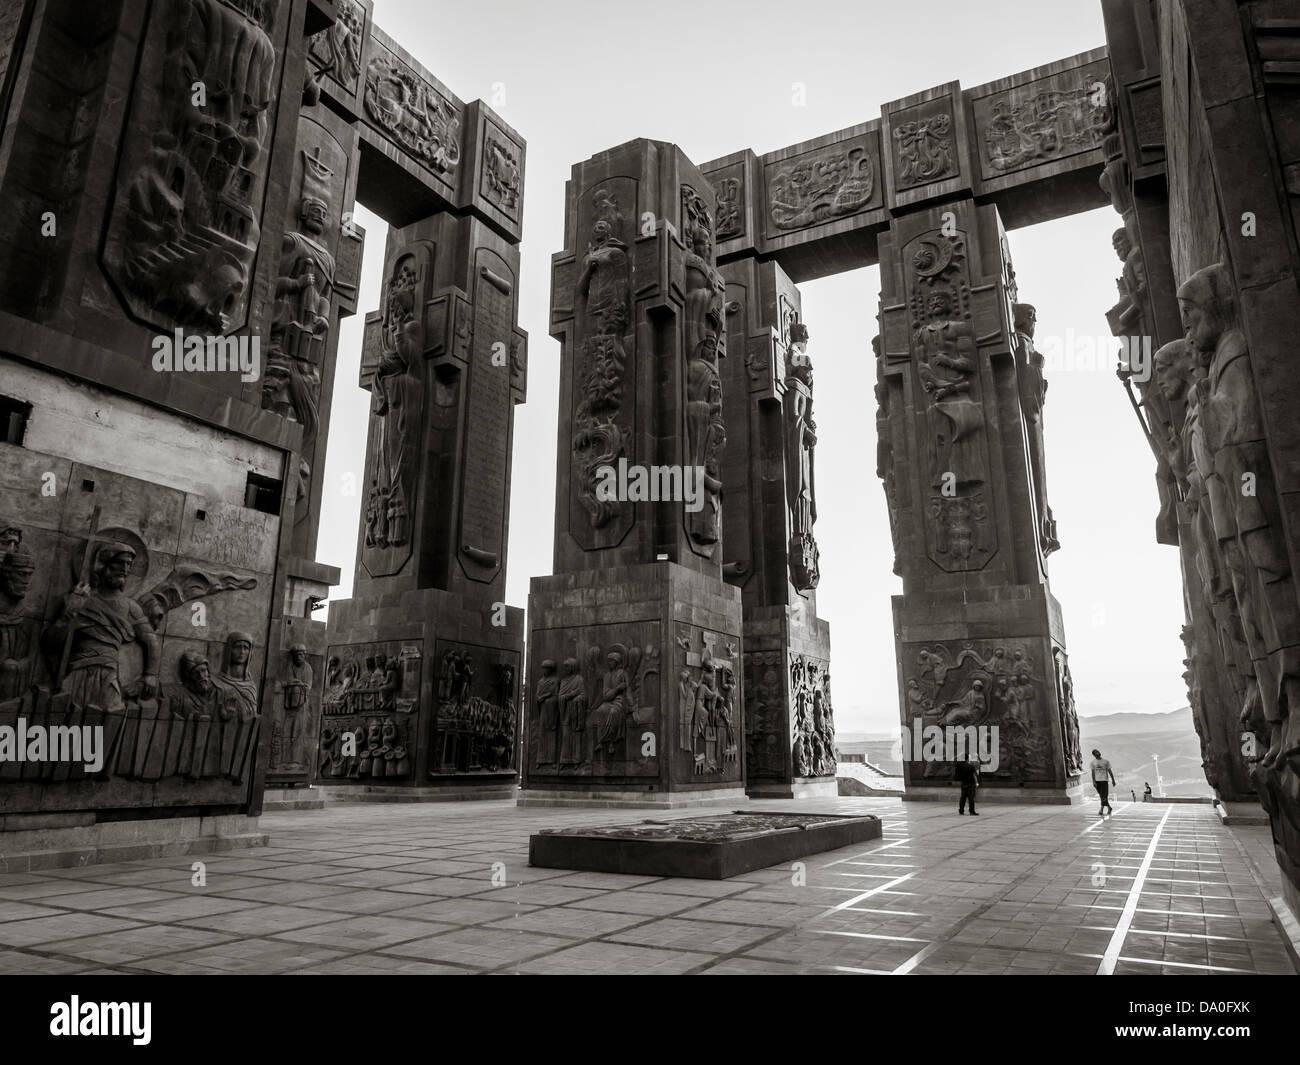 The Chronicle of Georgia (Stonehenge) in Tbilisi, Georgia. Stock Photo